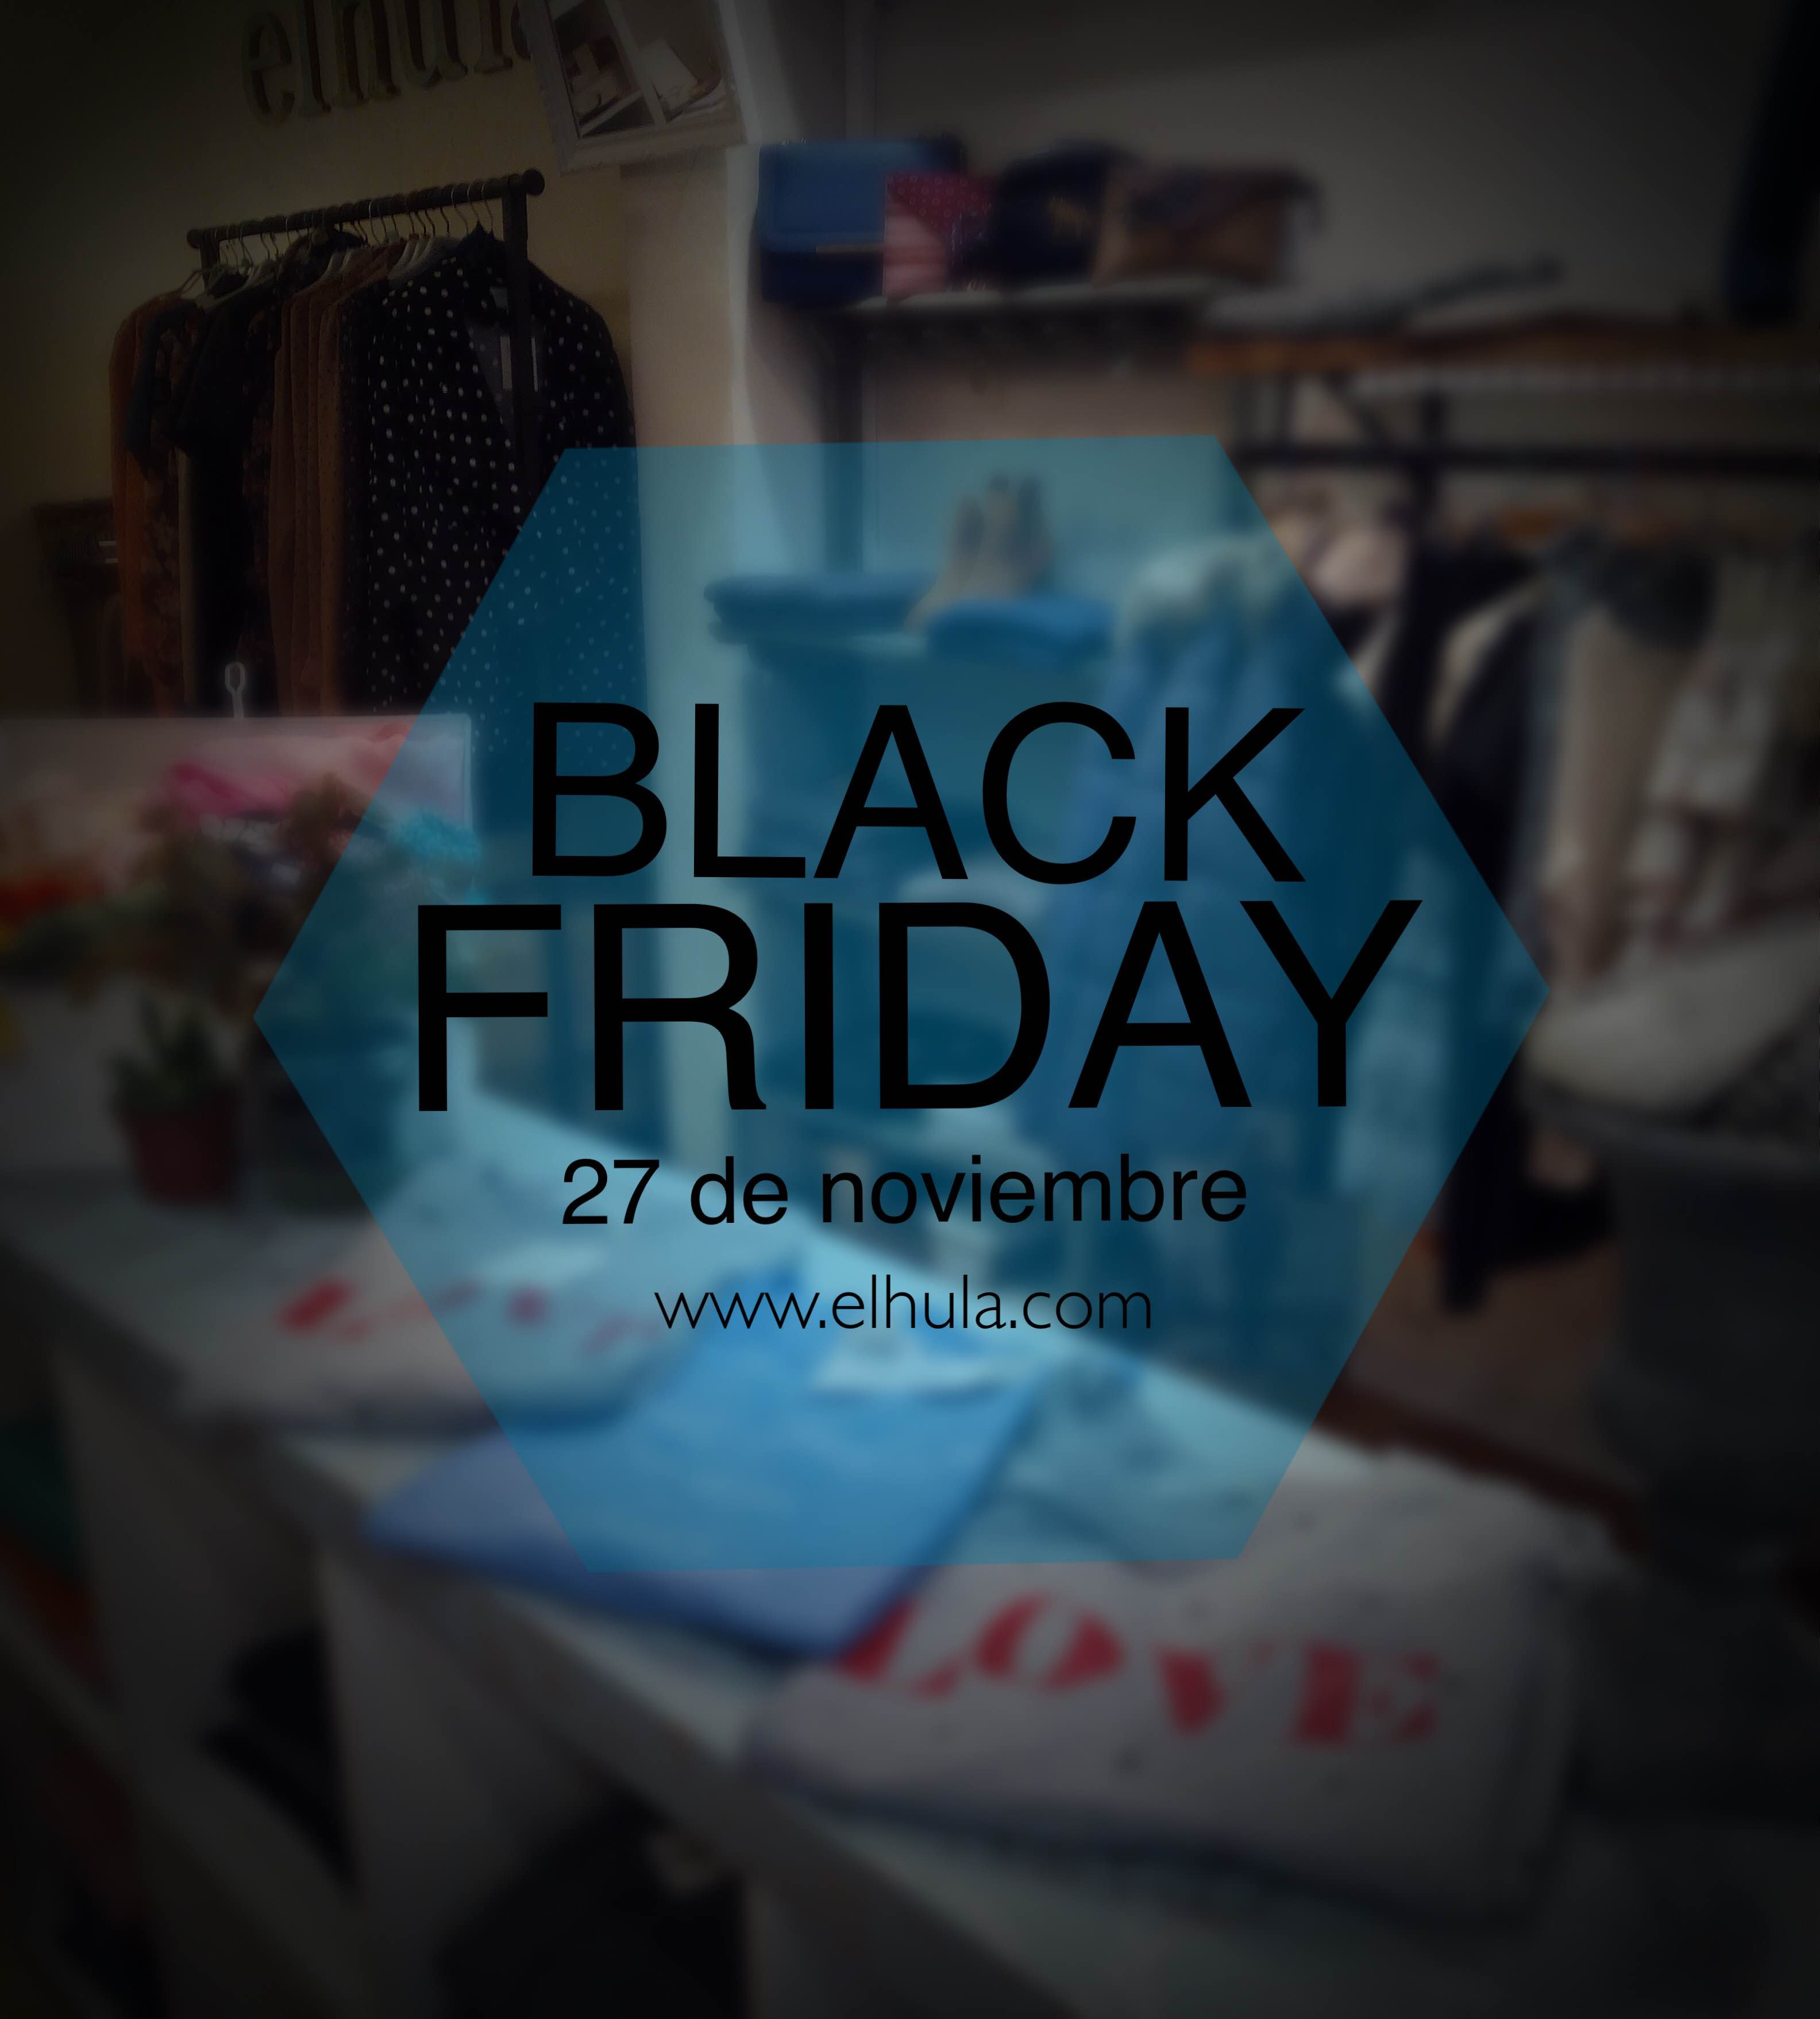 Black Friday 2015 en Elhula